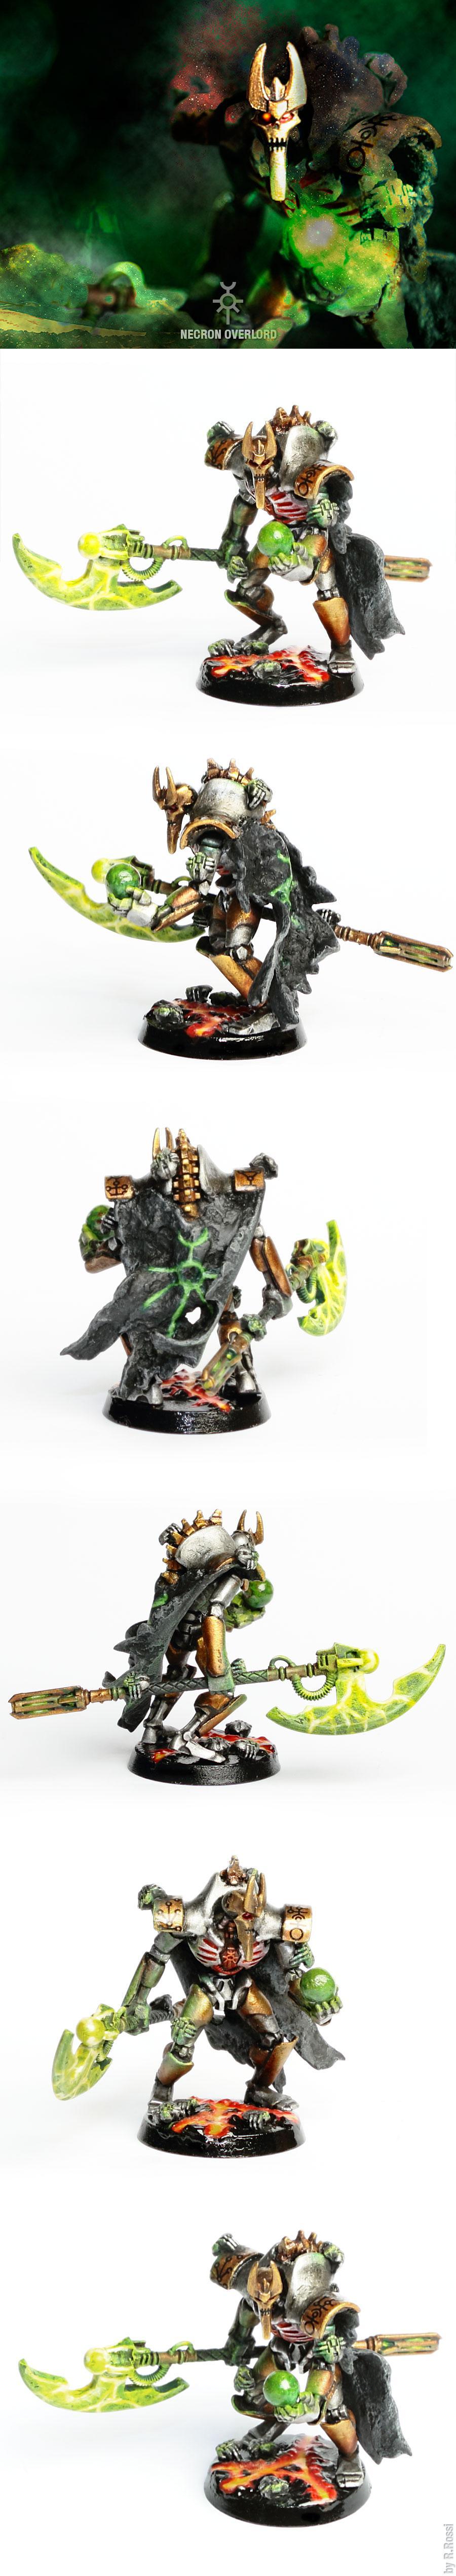 Conversion, Greenstuff, Mindshackle Scarabs, Necrons, Overlord, Phylactery, Resurrection Orb, Sempiternal Waves, Warhammer 40,000, Warscythe